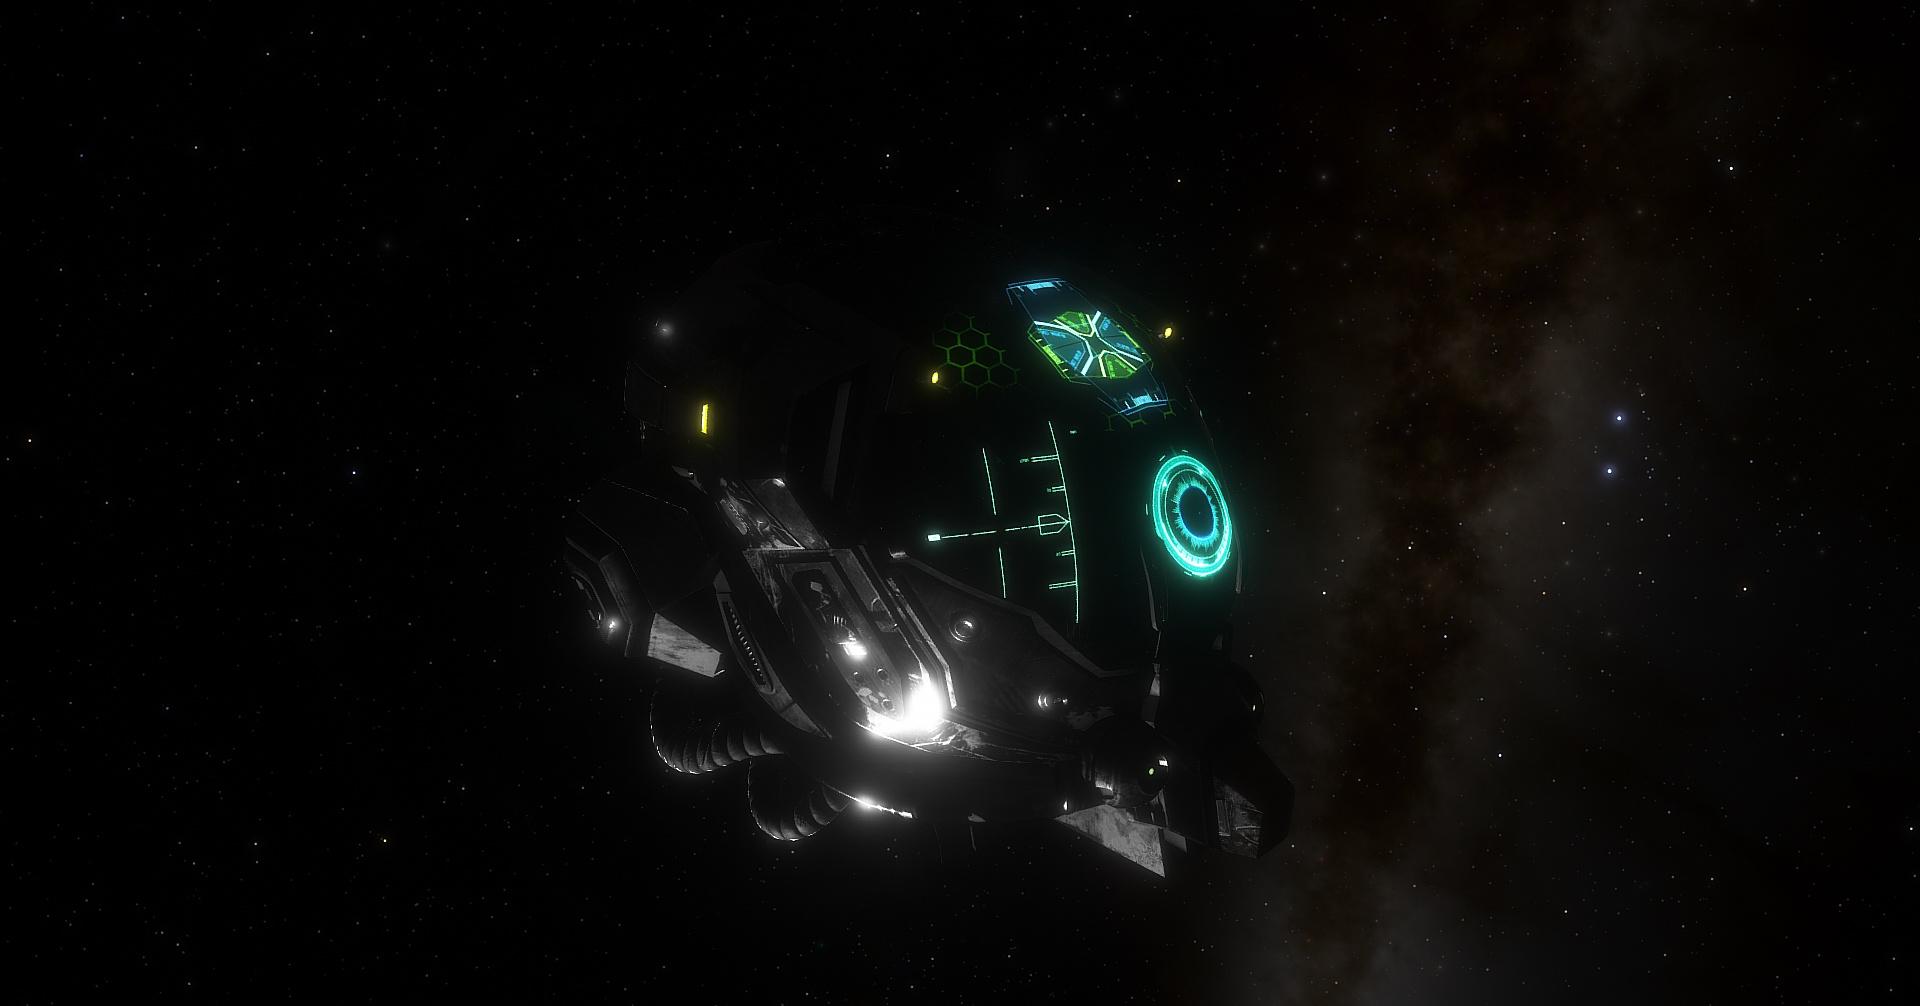 scr00150 | Космический симулятор SpaceEngine